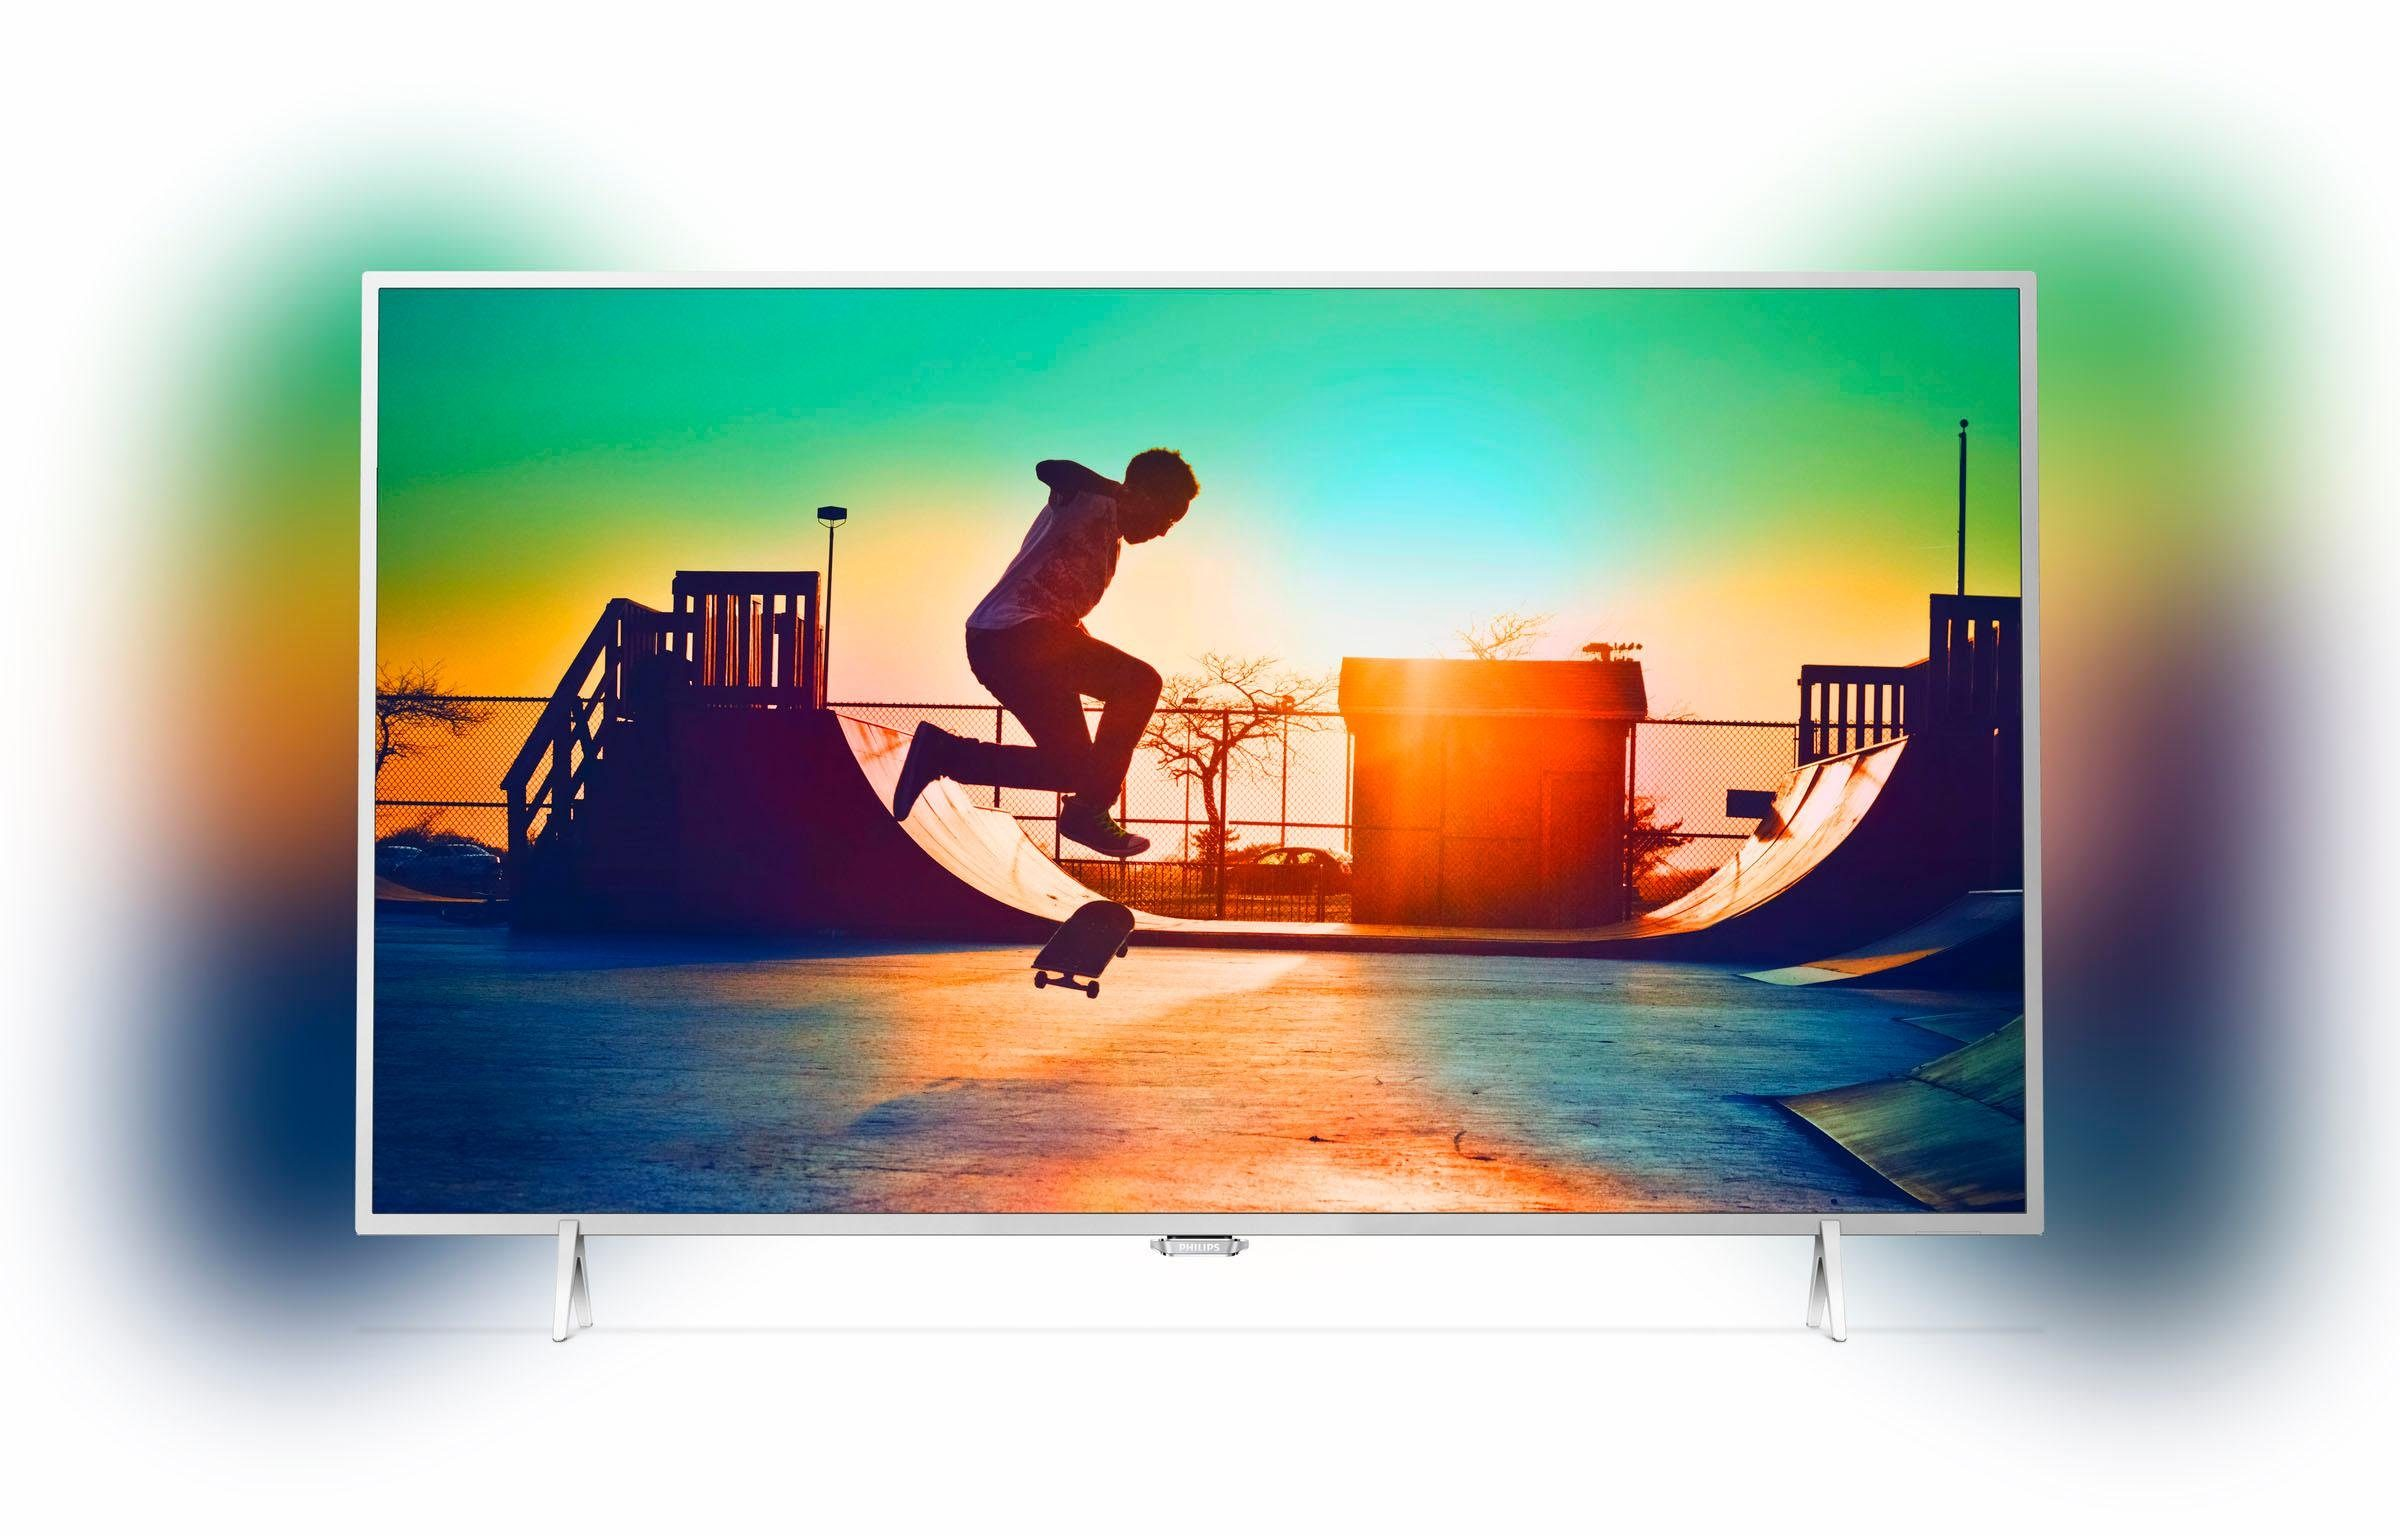 Philips 32PFS6402/12 LED-Fernseher (80 cm/32 Zoll, Full HD, Smart-TV, USB-Recording) - Philips